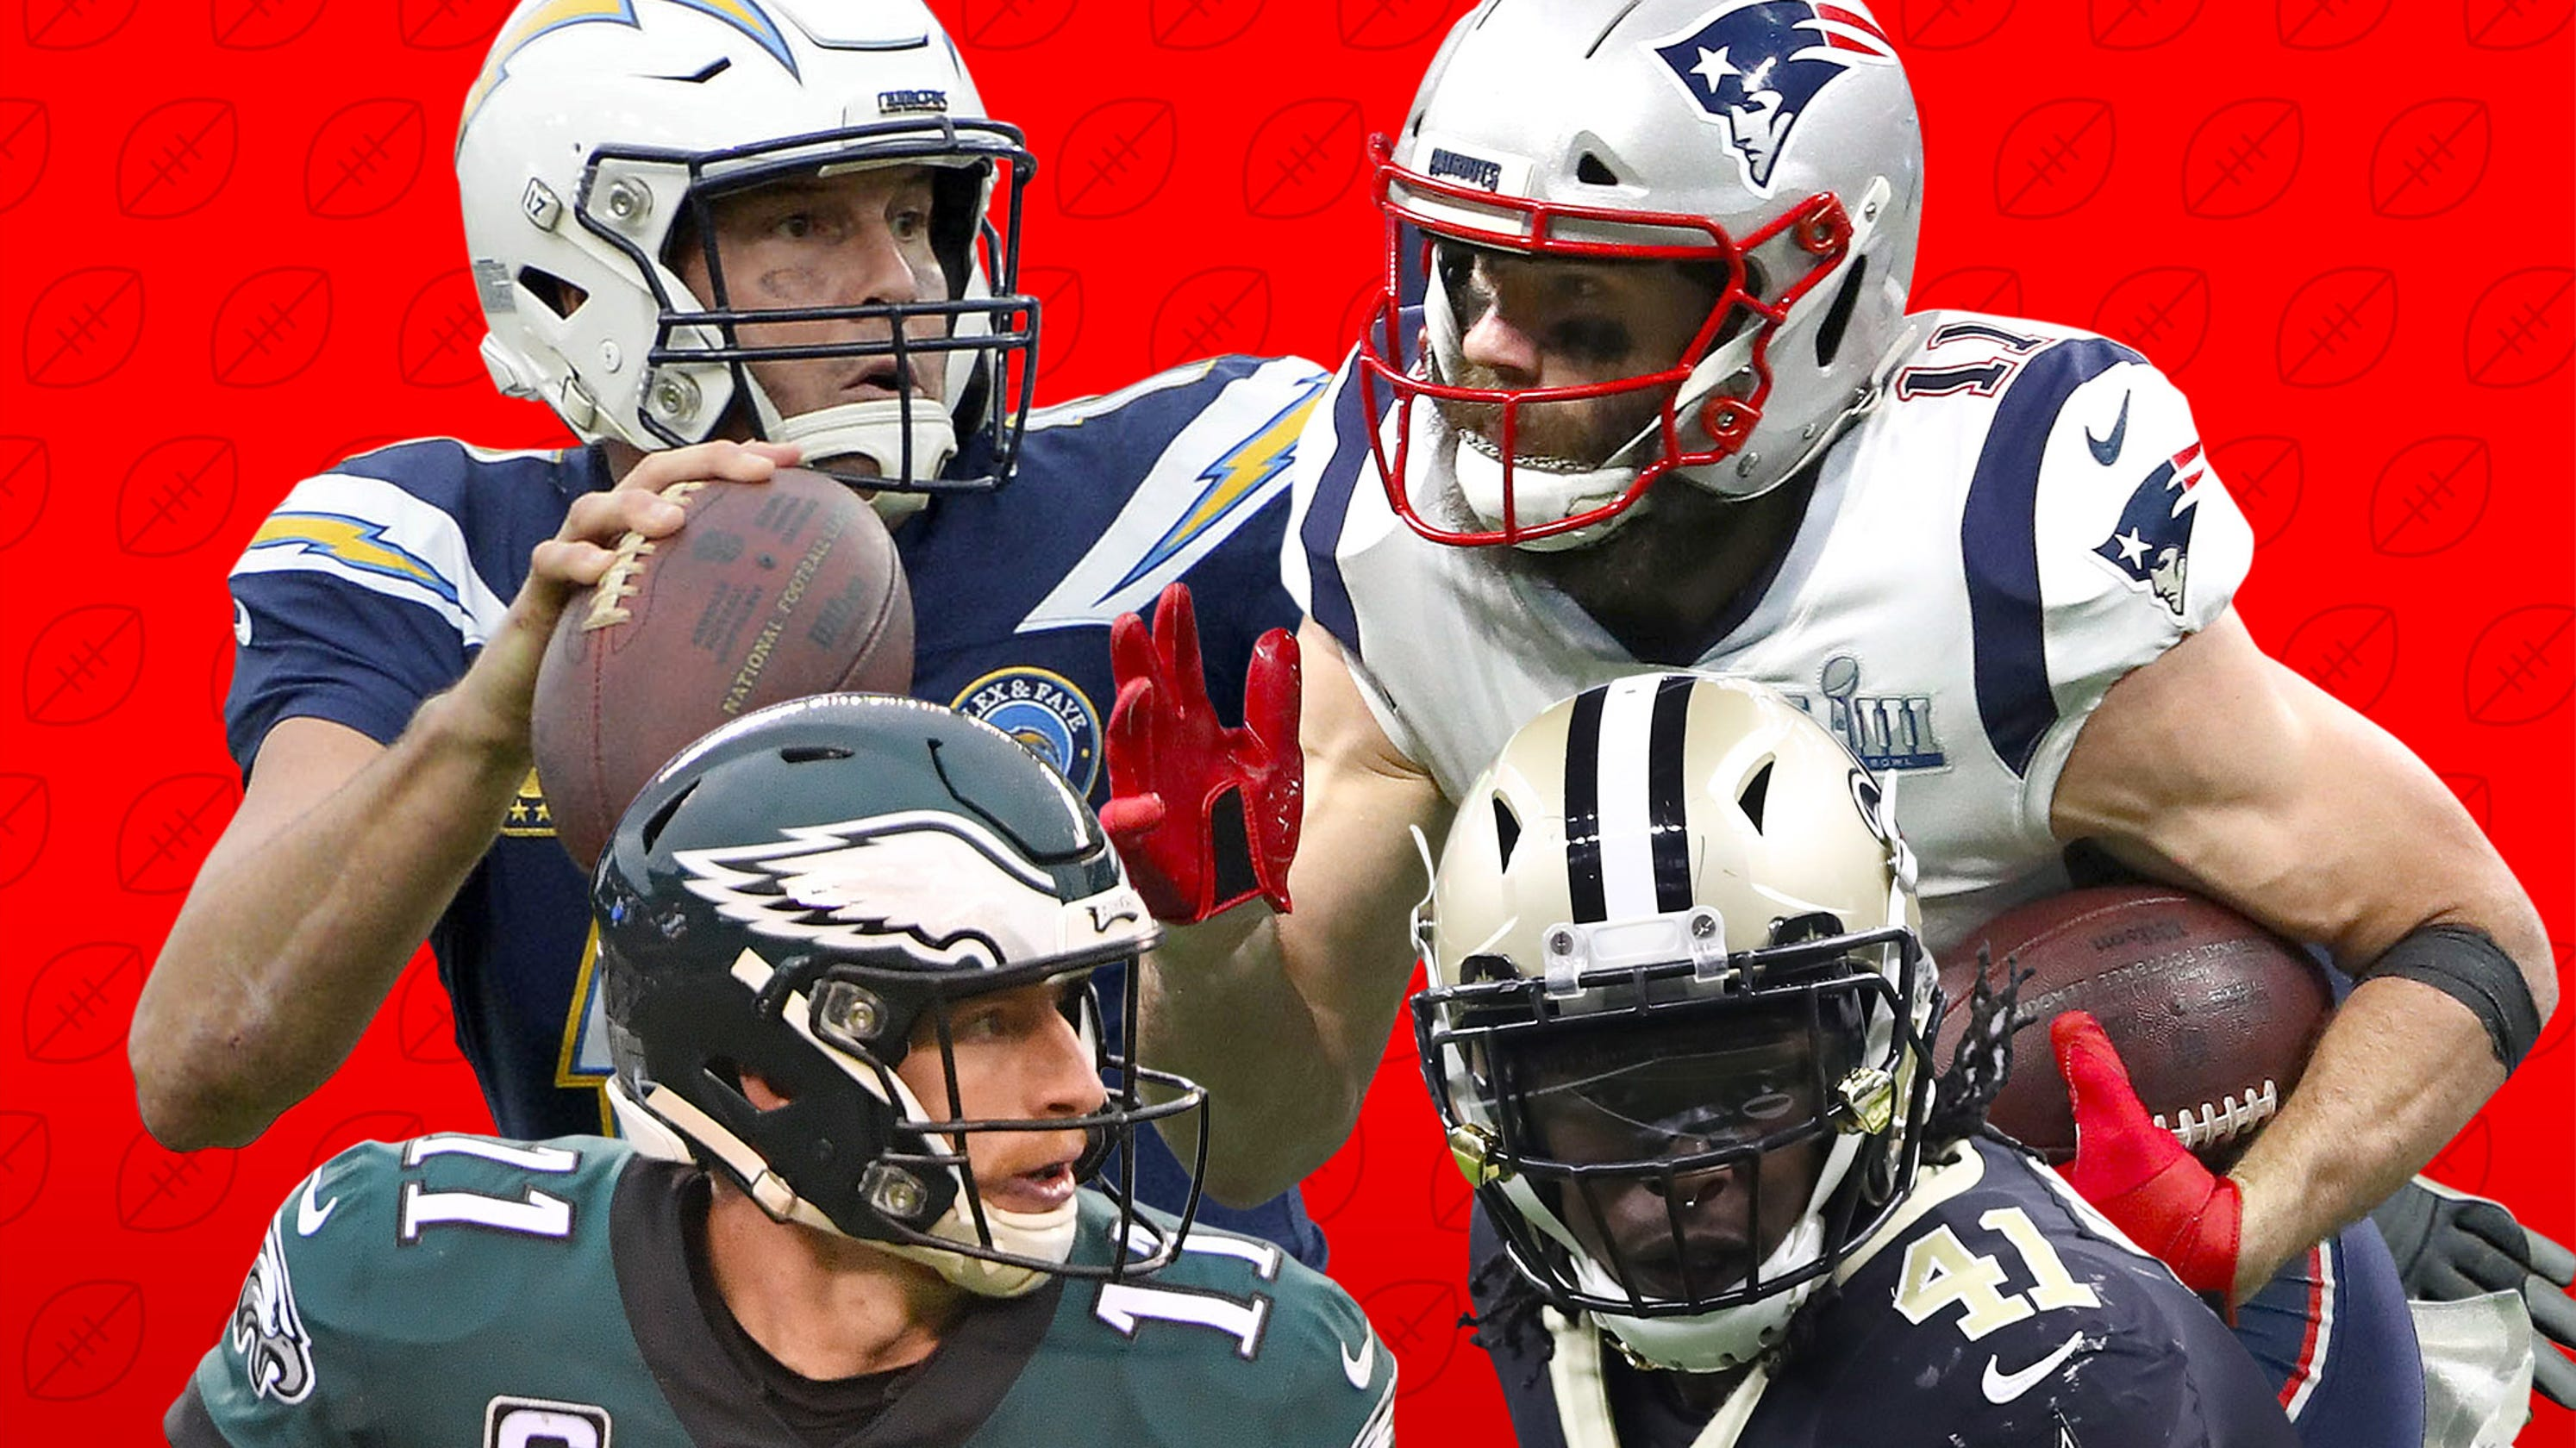 2019 NFL record predictions: Will Patriots return to Super Bowl?